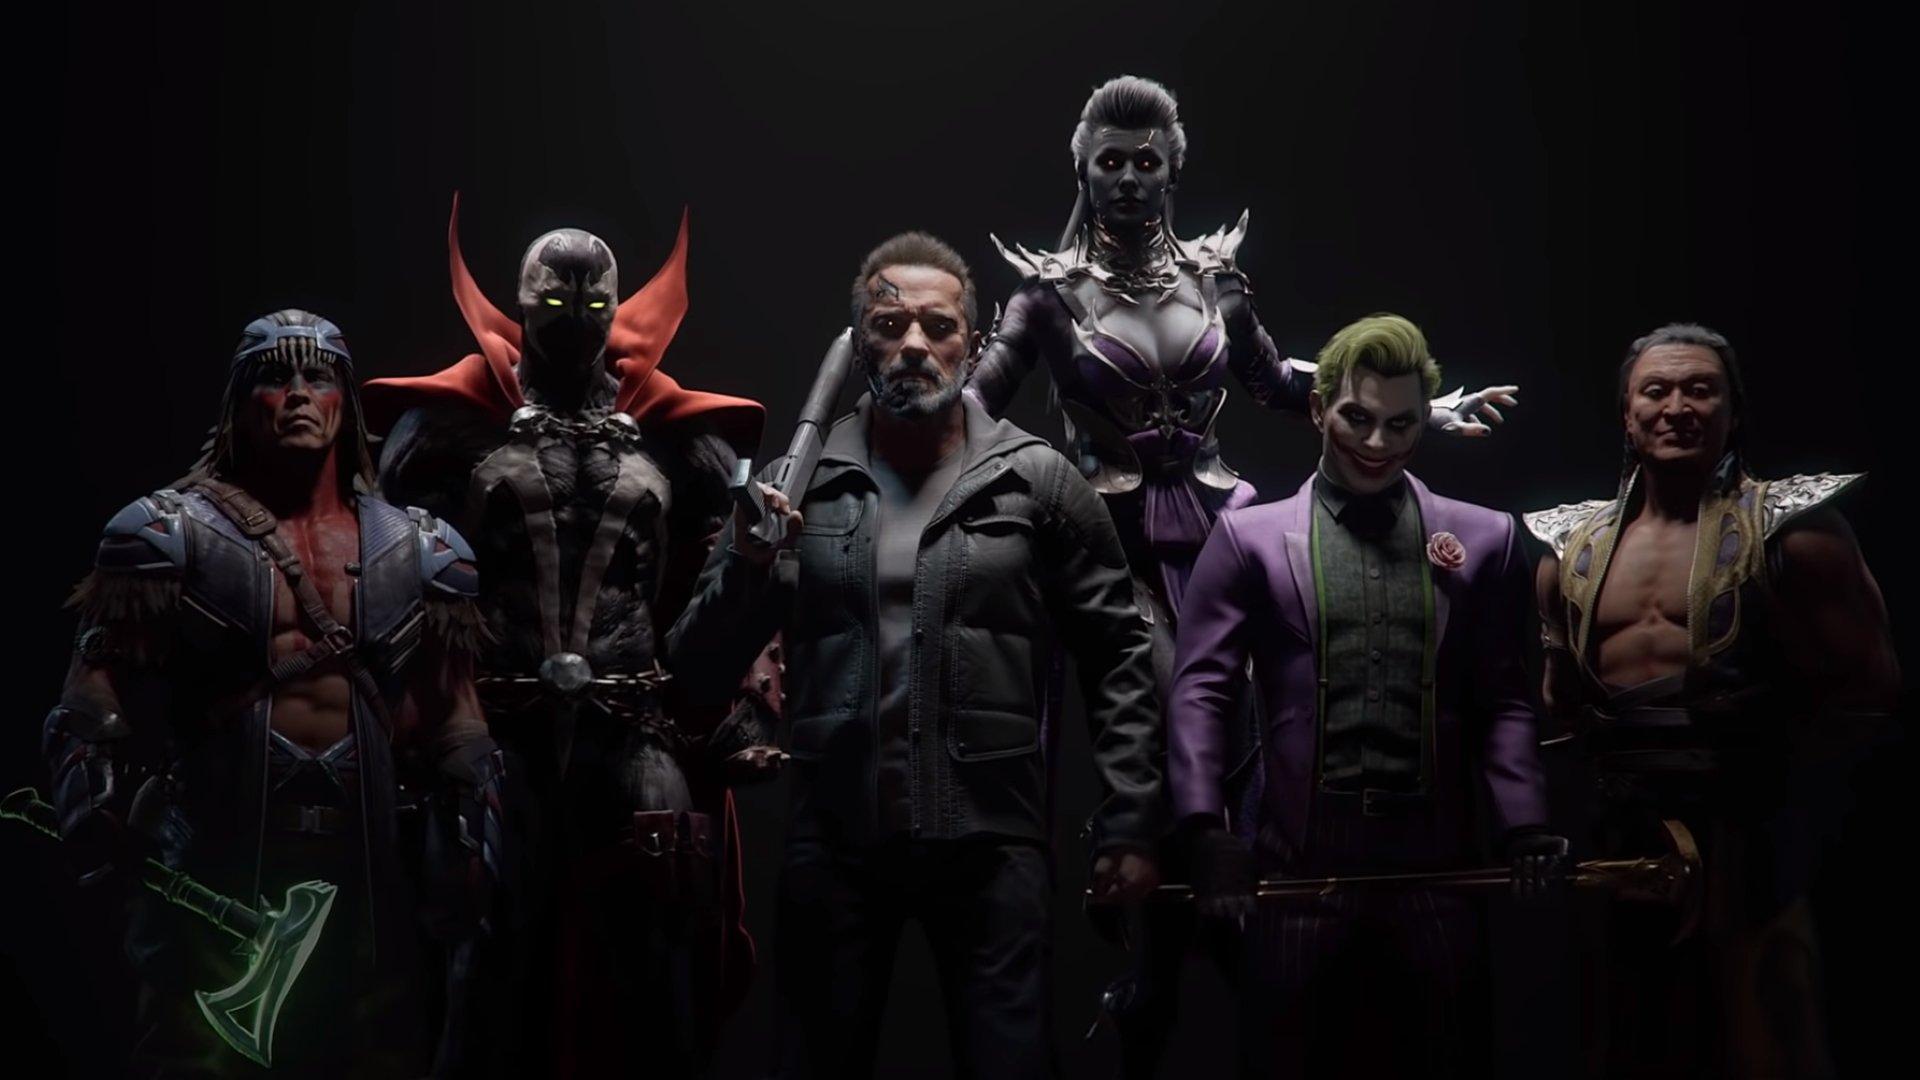 Terminator et Joker rejoignent Mortal Kombat 11 dans Kombat Pack 1